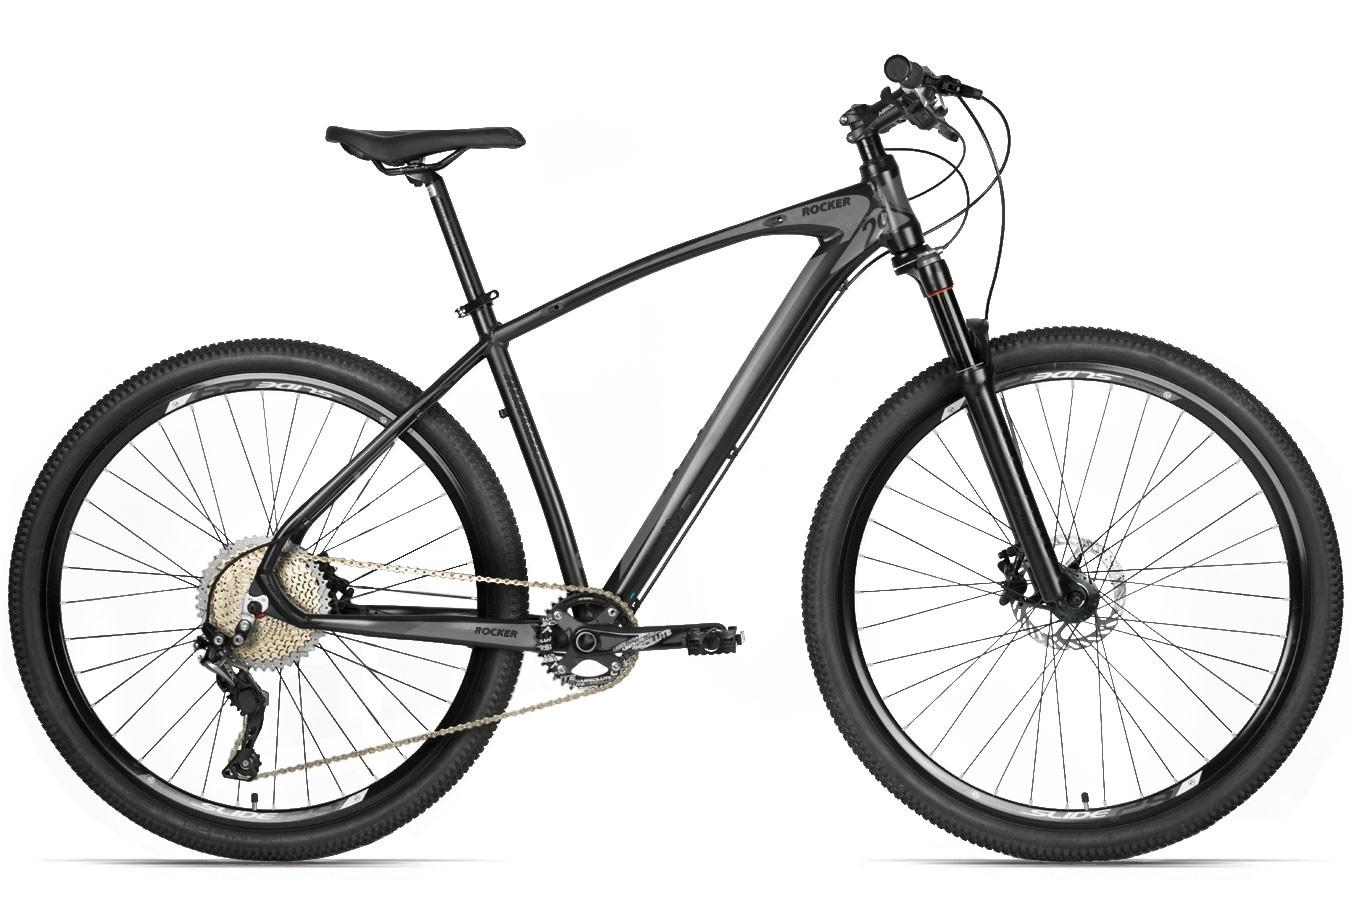 Bicicleta 29 MTB Rocker II SLX 11V Freio Hidráulico Suspensão Ar - Elleven